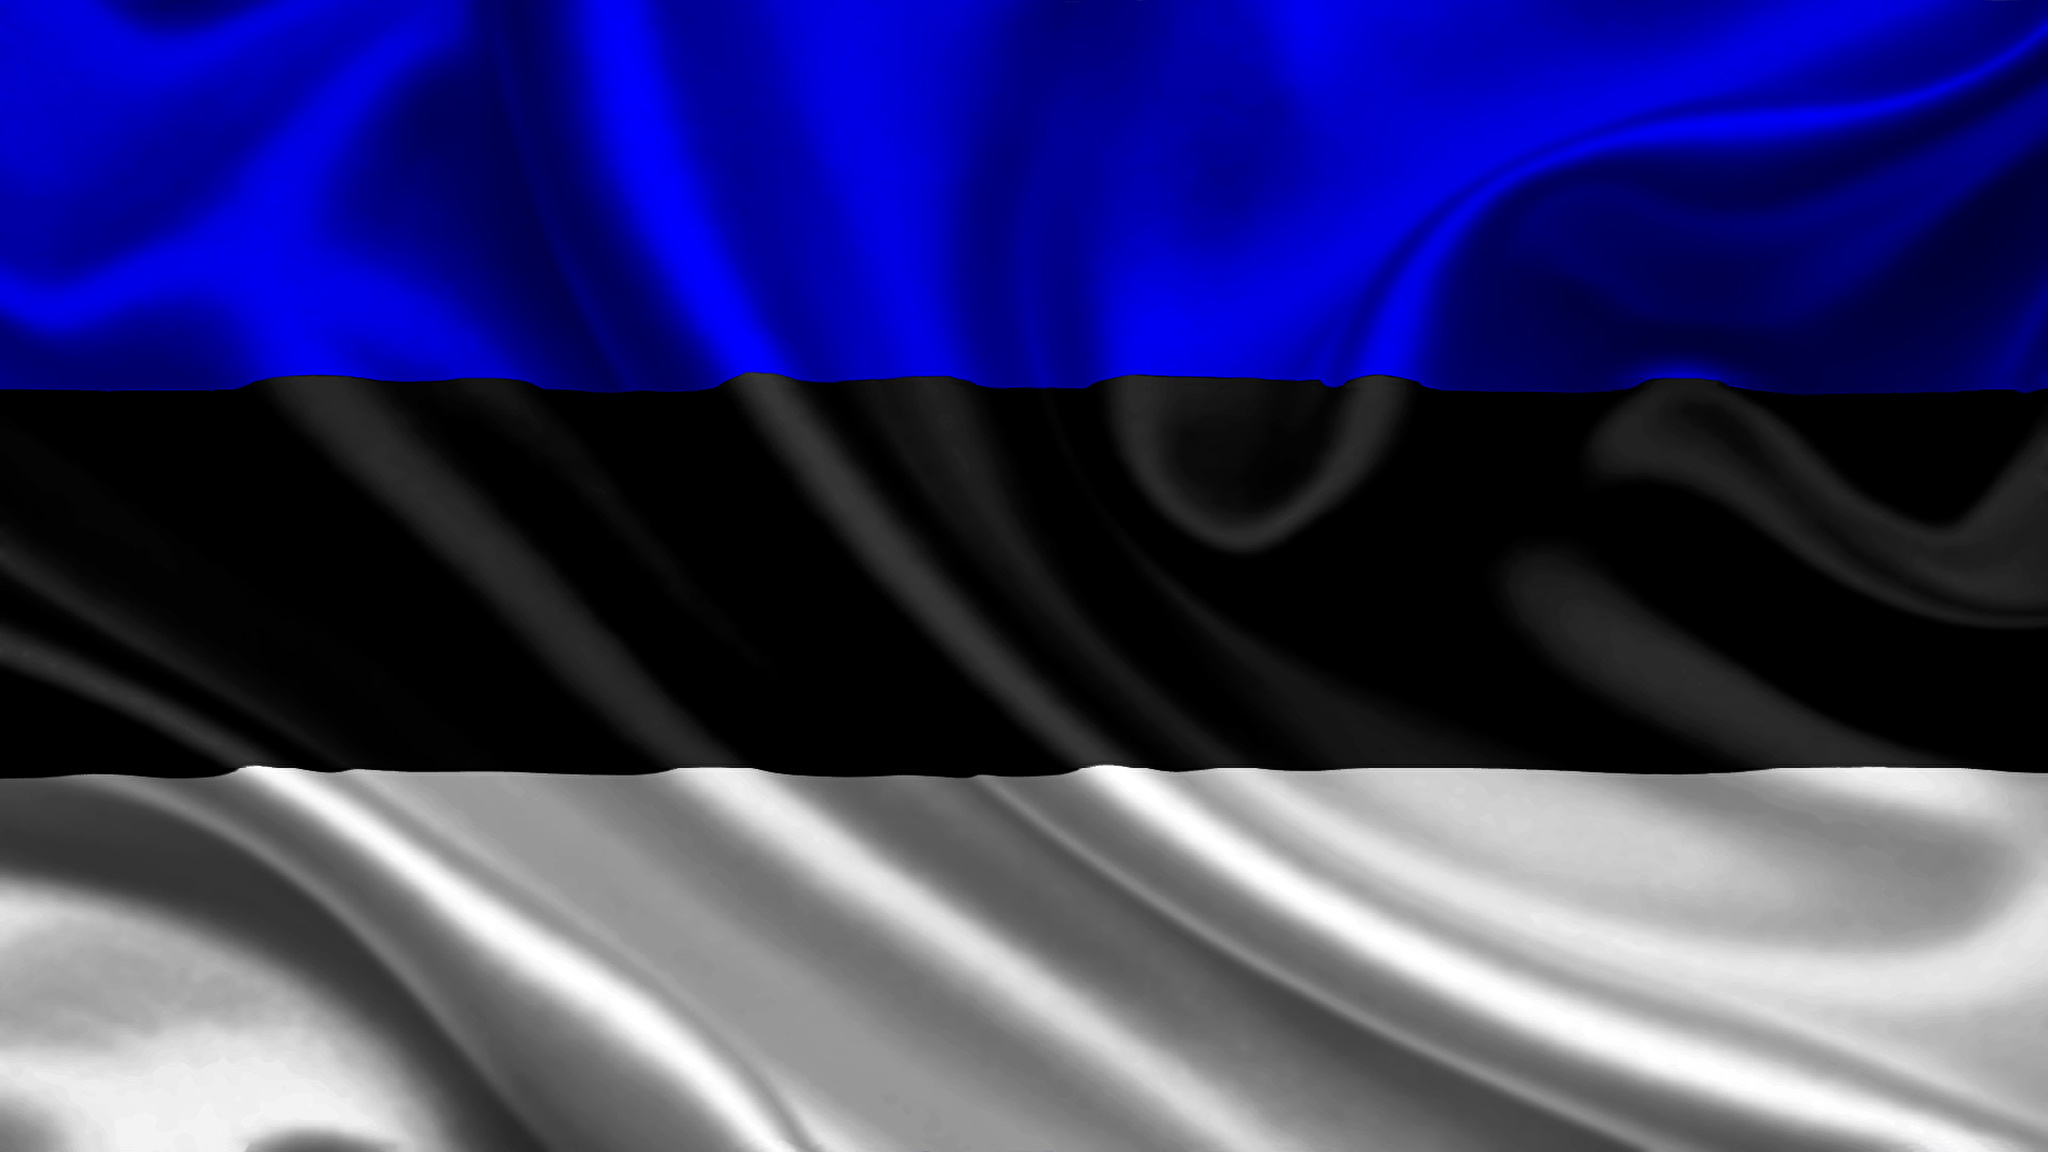 Flag Of Estonia Wallpapers   DodoWallpaper 2048x1152